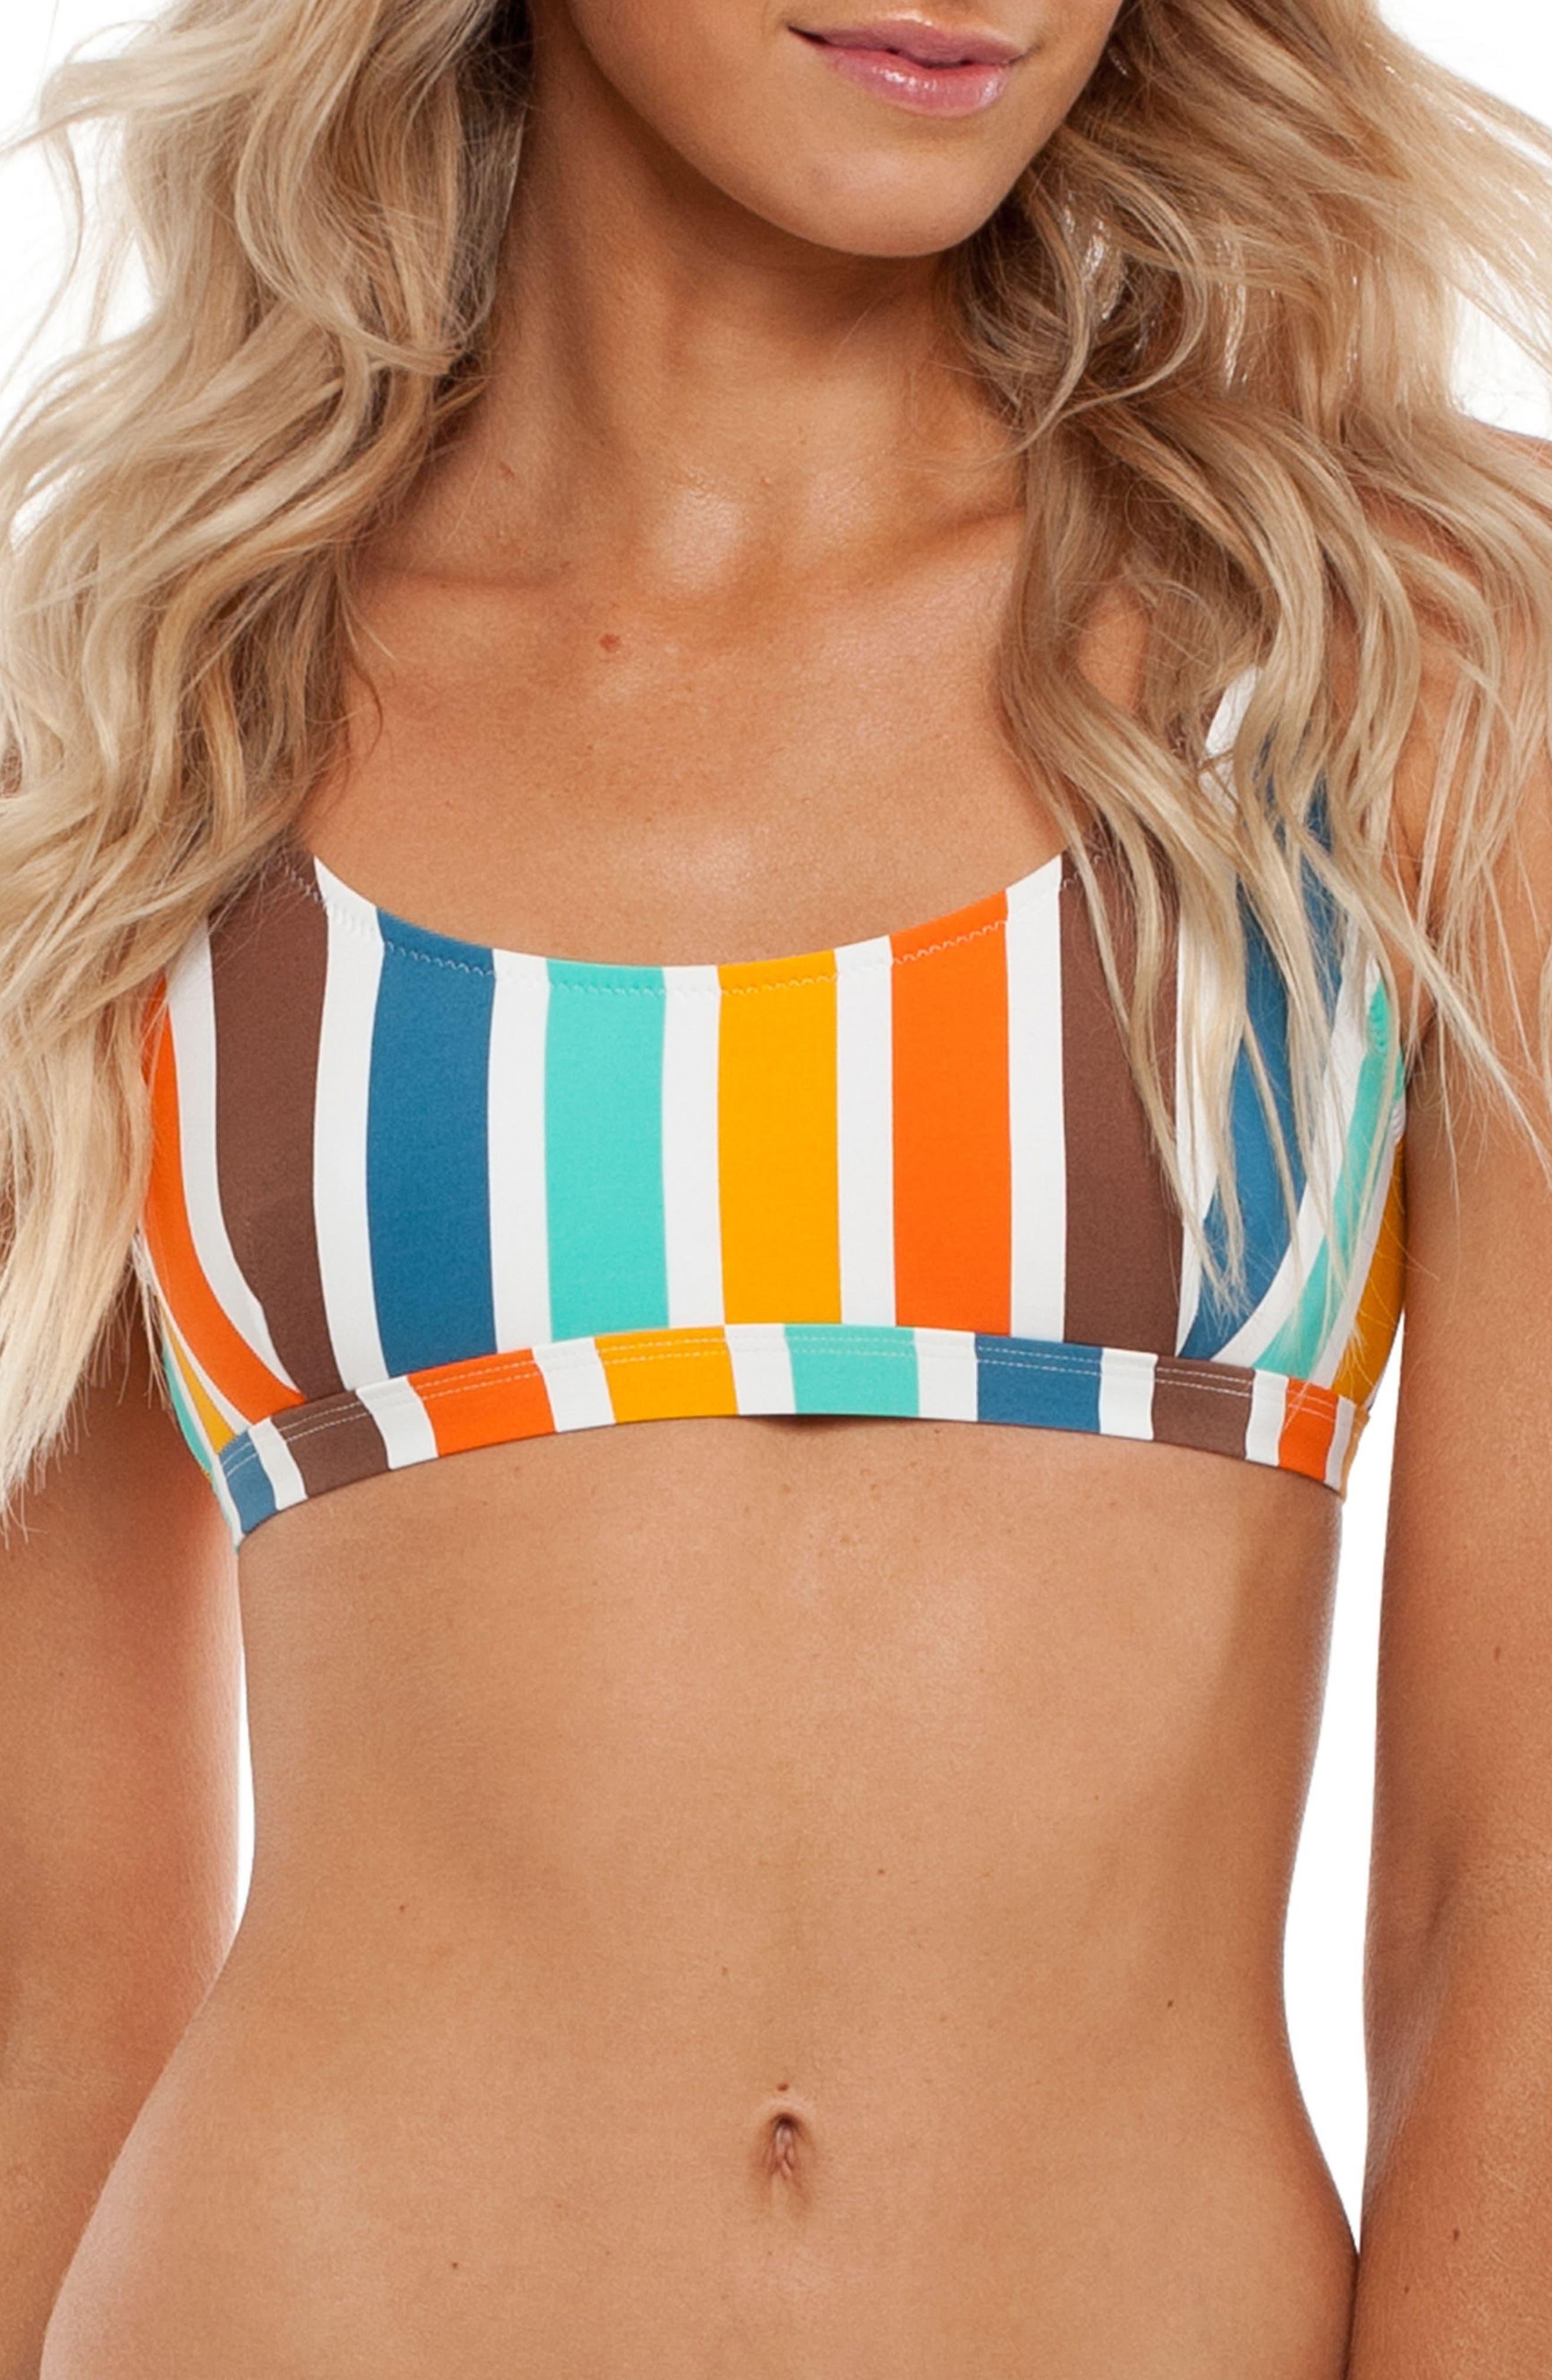 Zimbabwe Scoop Bikini Top,                         Main,                         color, 810